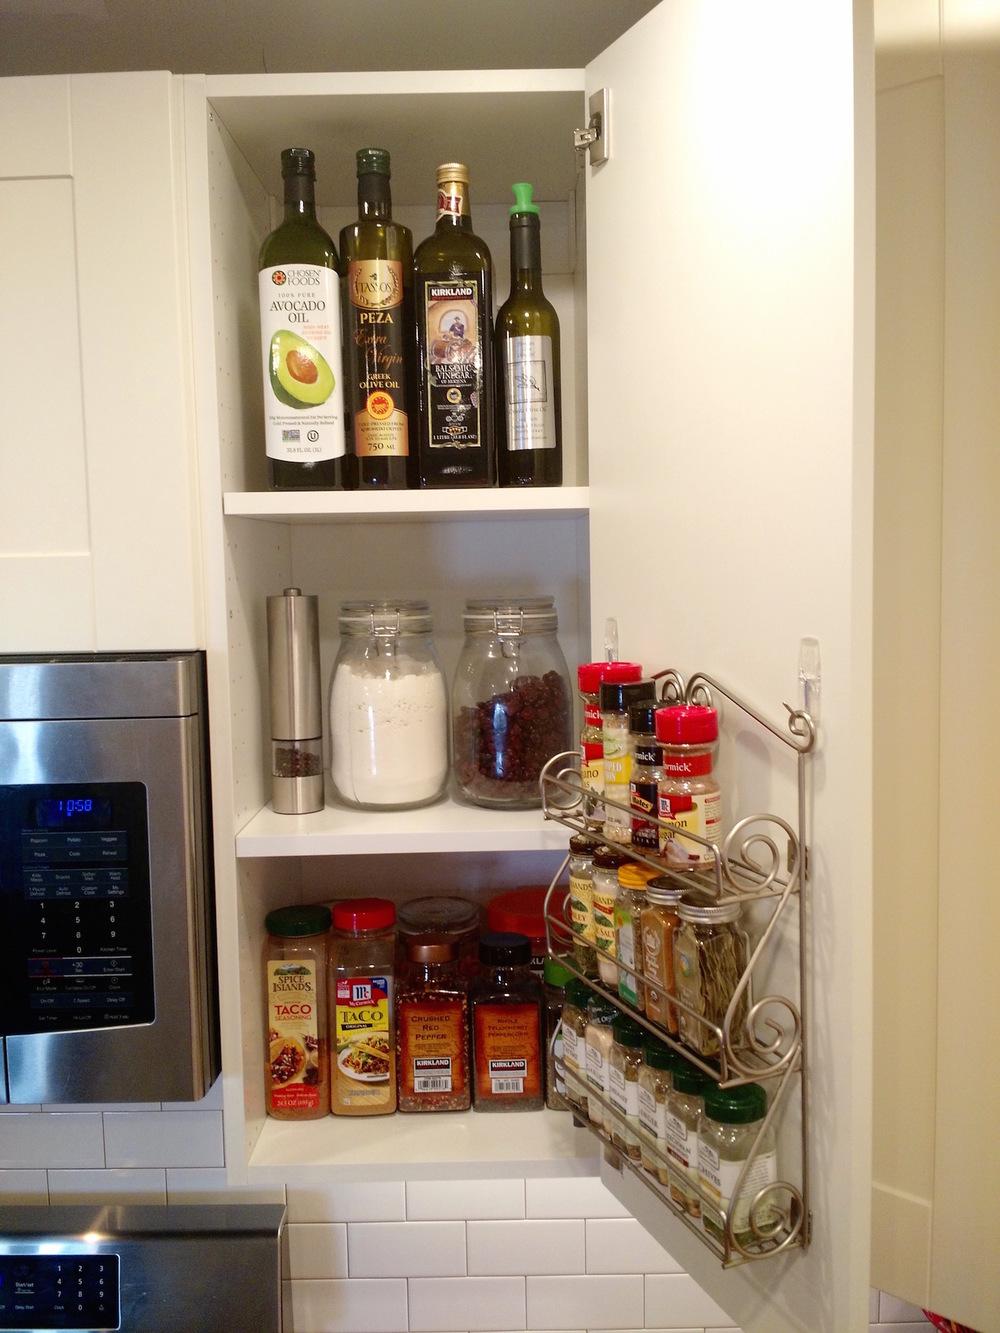 cabinet-2-after.jpg